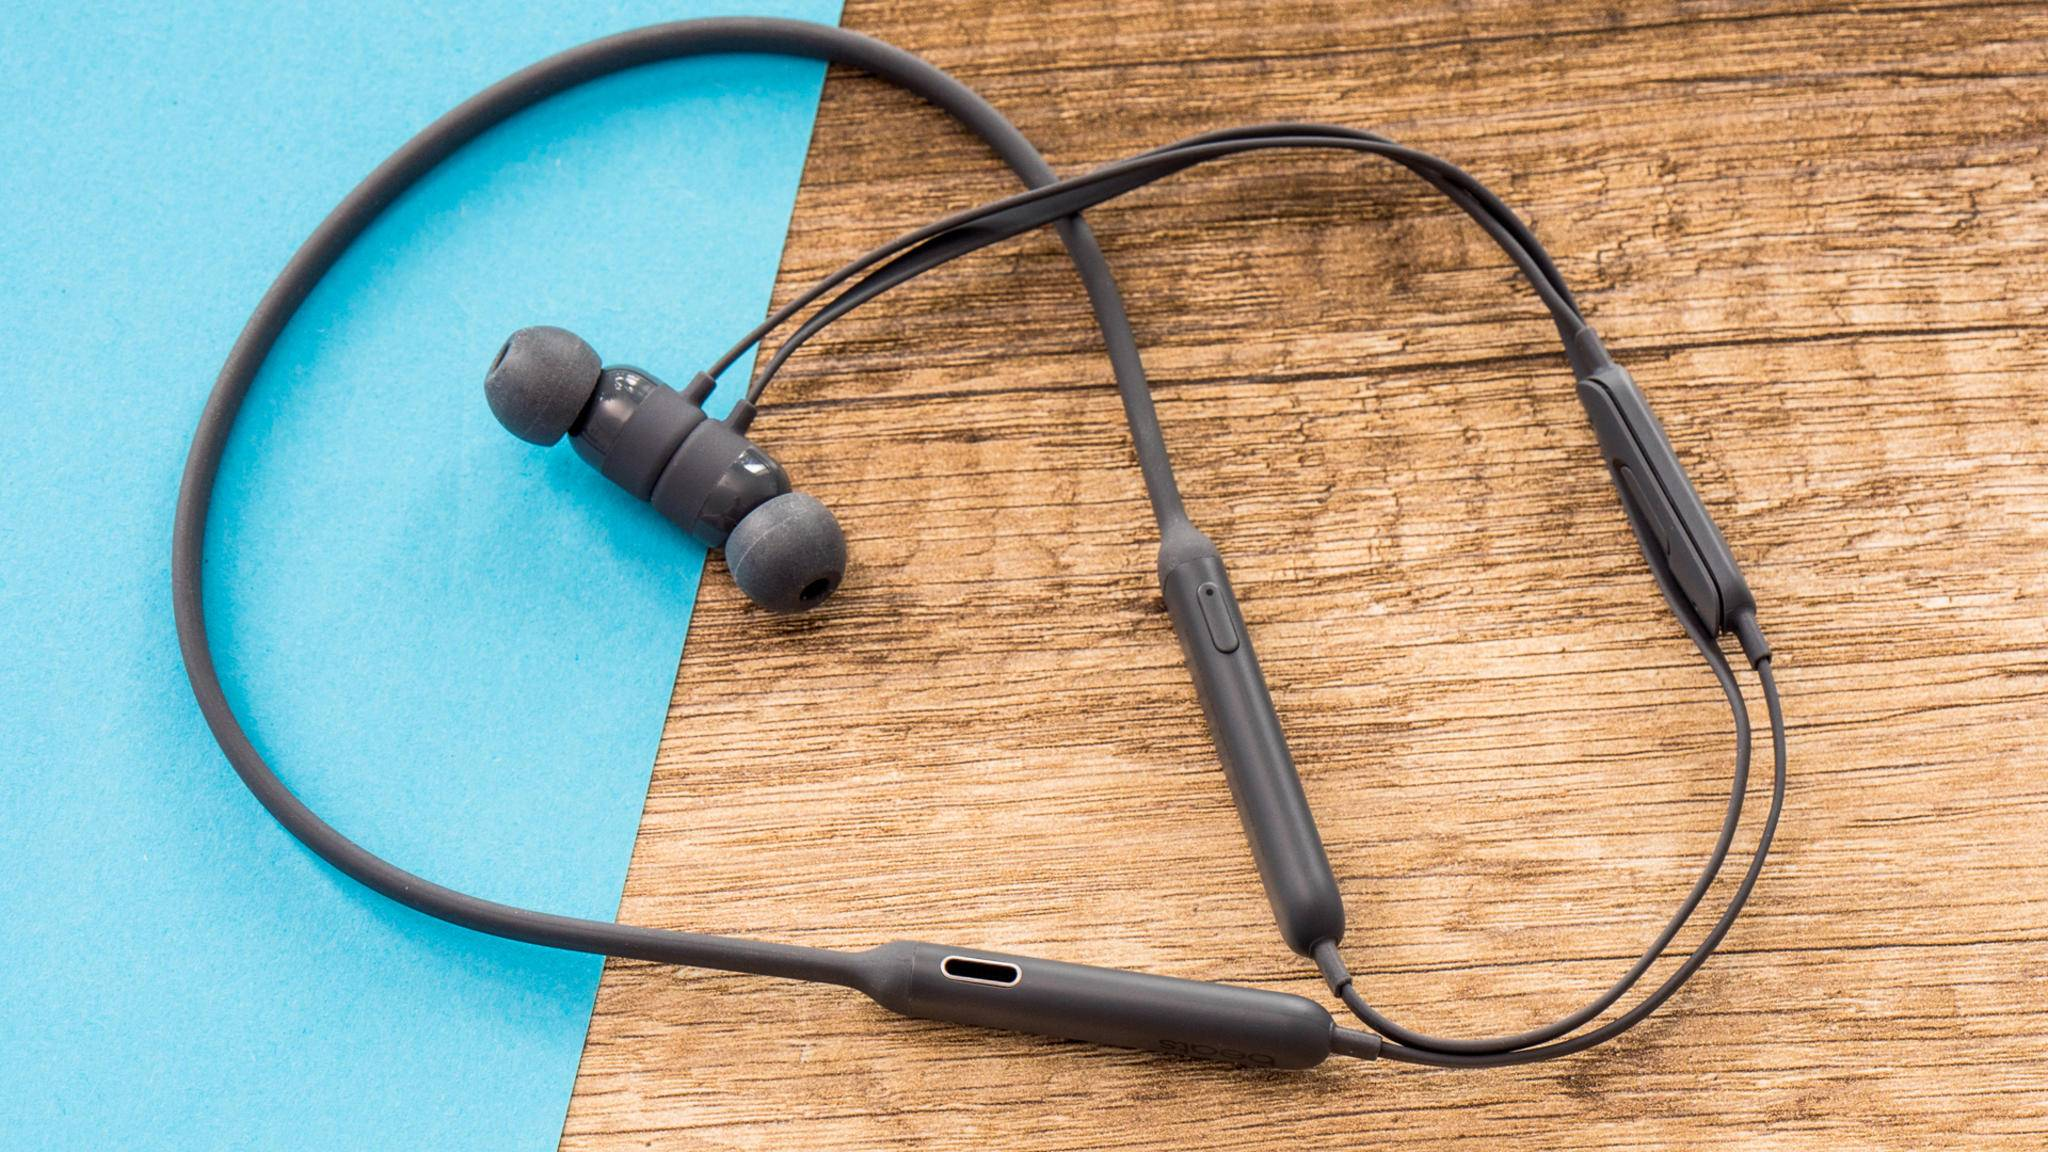 Studenten bekommen beim Kauf einiger Macs oder iPad Pros einen kabellosen Beats-Kopfhörer wie den Beats X geschenkt.